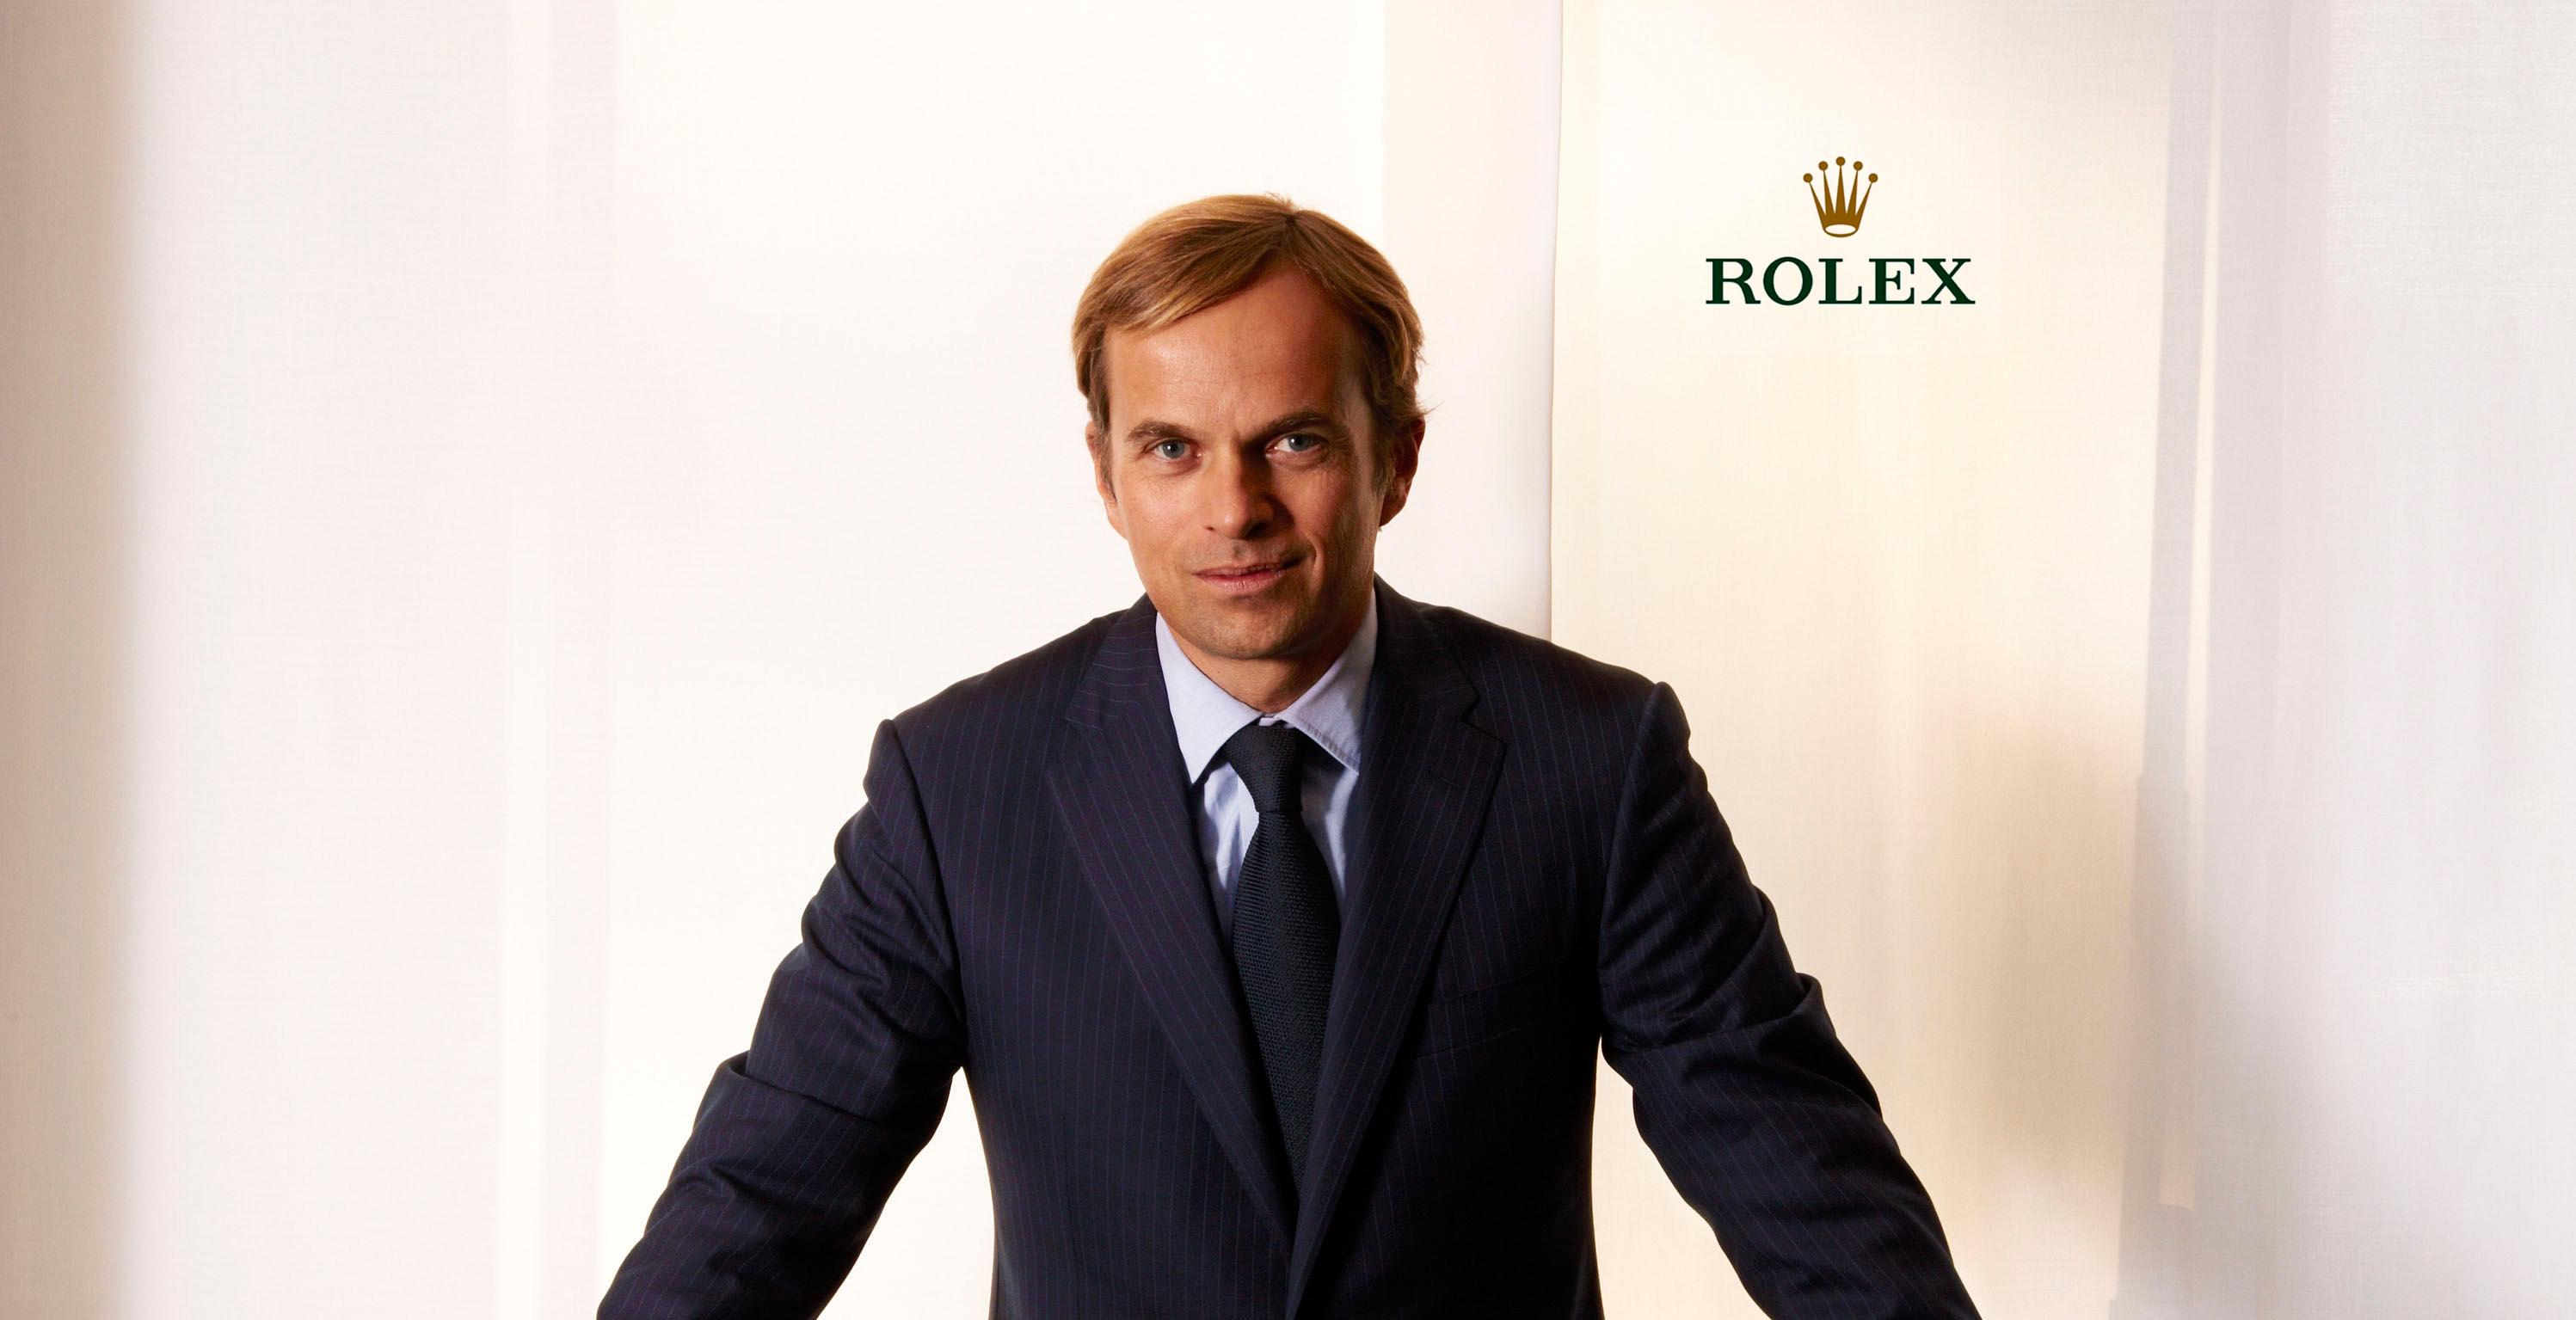 Jean-Frederic-Dufour-Rolex